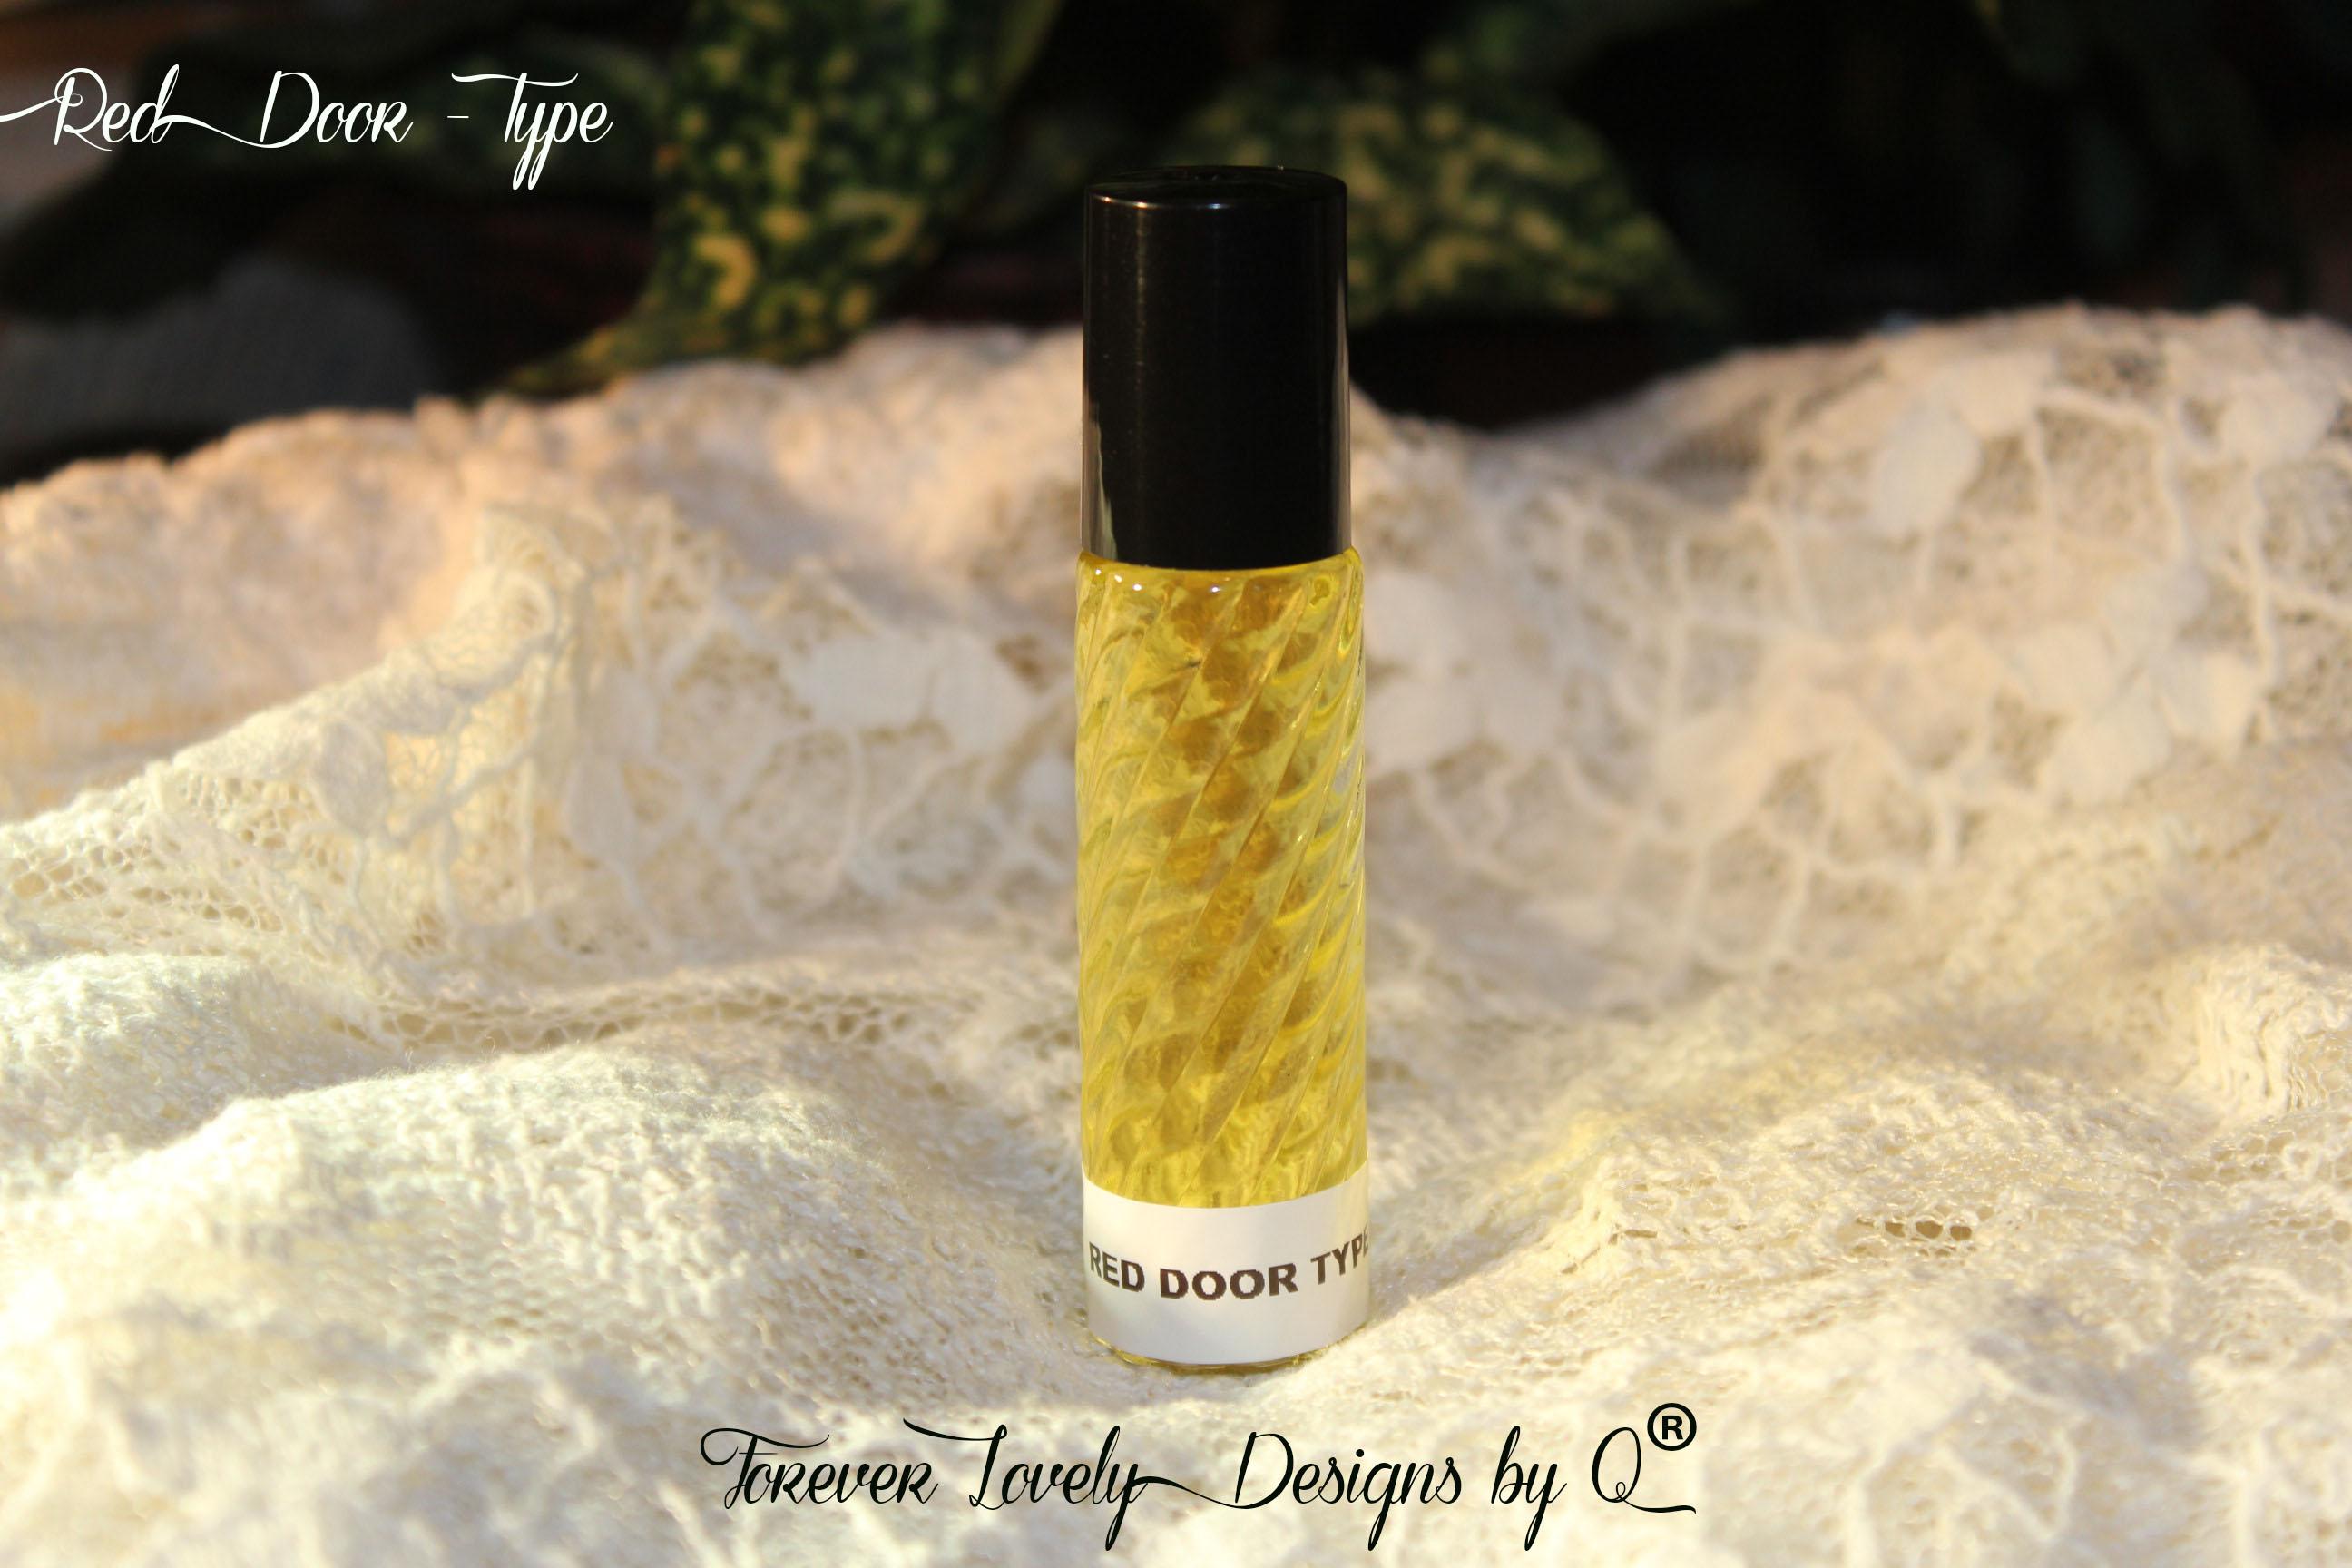 Red Door Type Fragrance Oil 1 Oz Forever Lovely Designs By Q